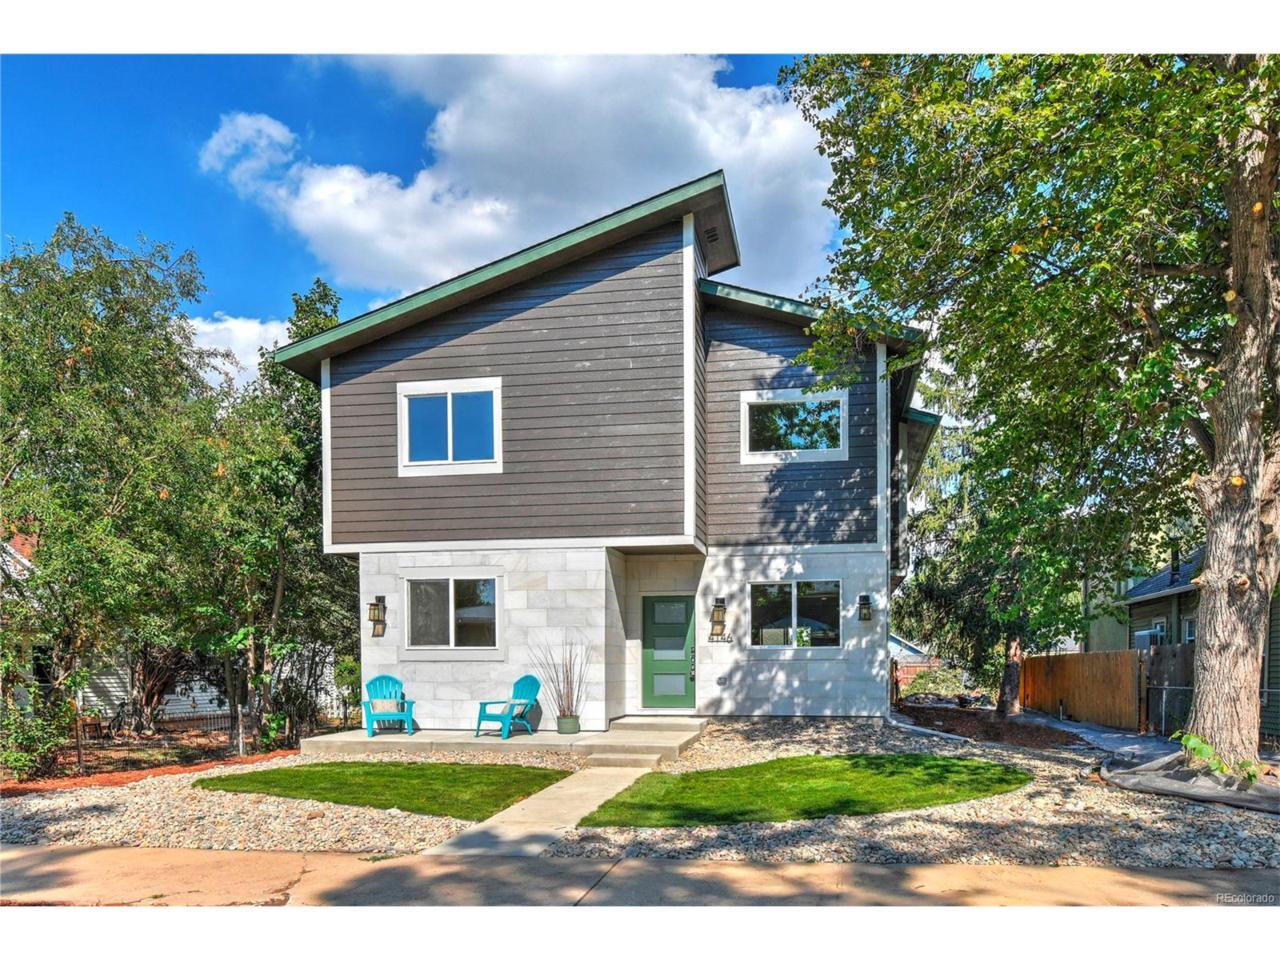 4146 Benton Street, Denver, CO 80212 (MLS #7428433) :: 8z Real Estate